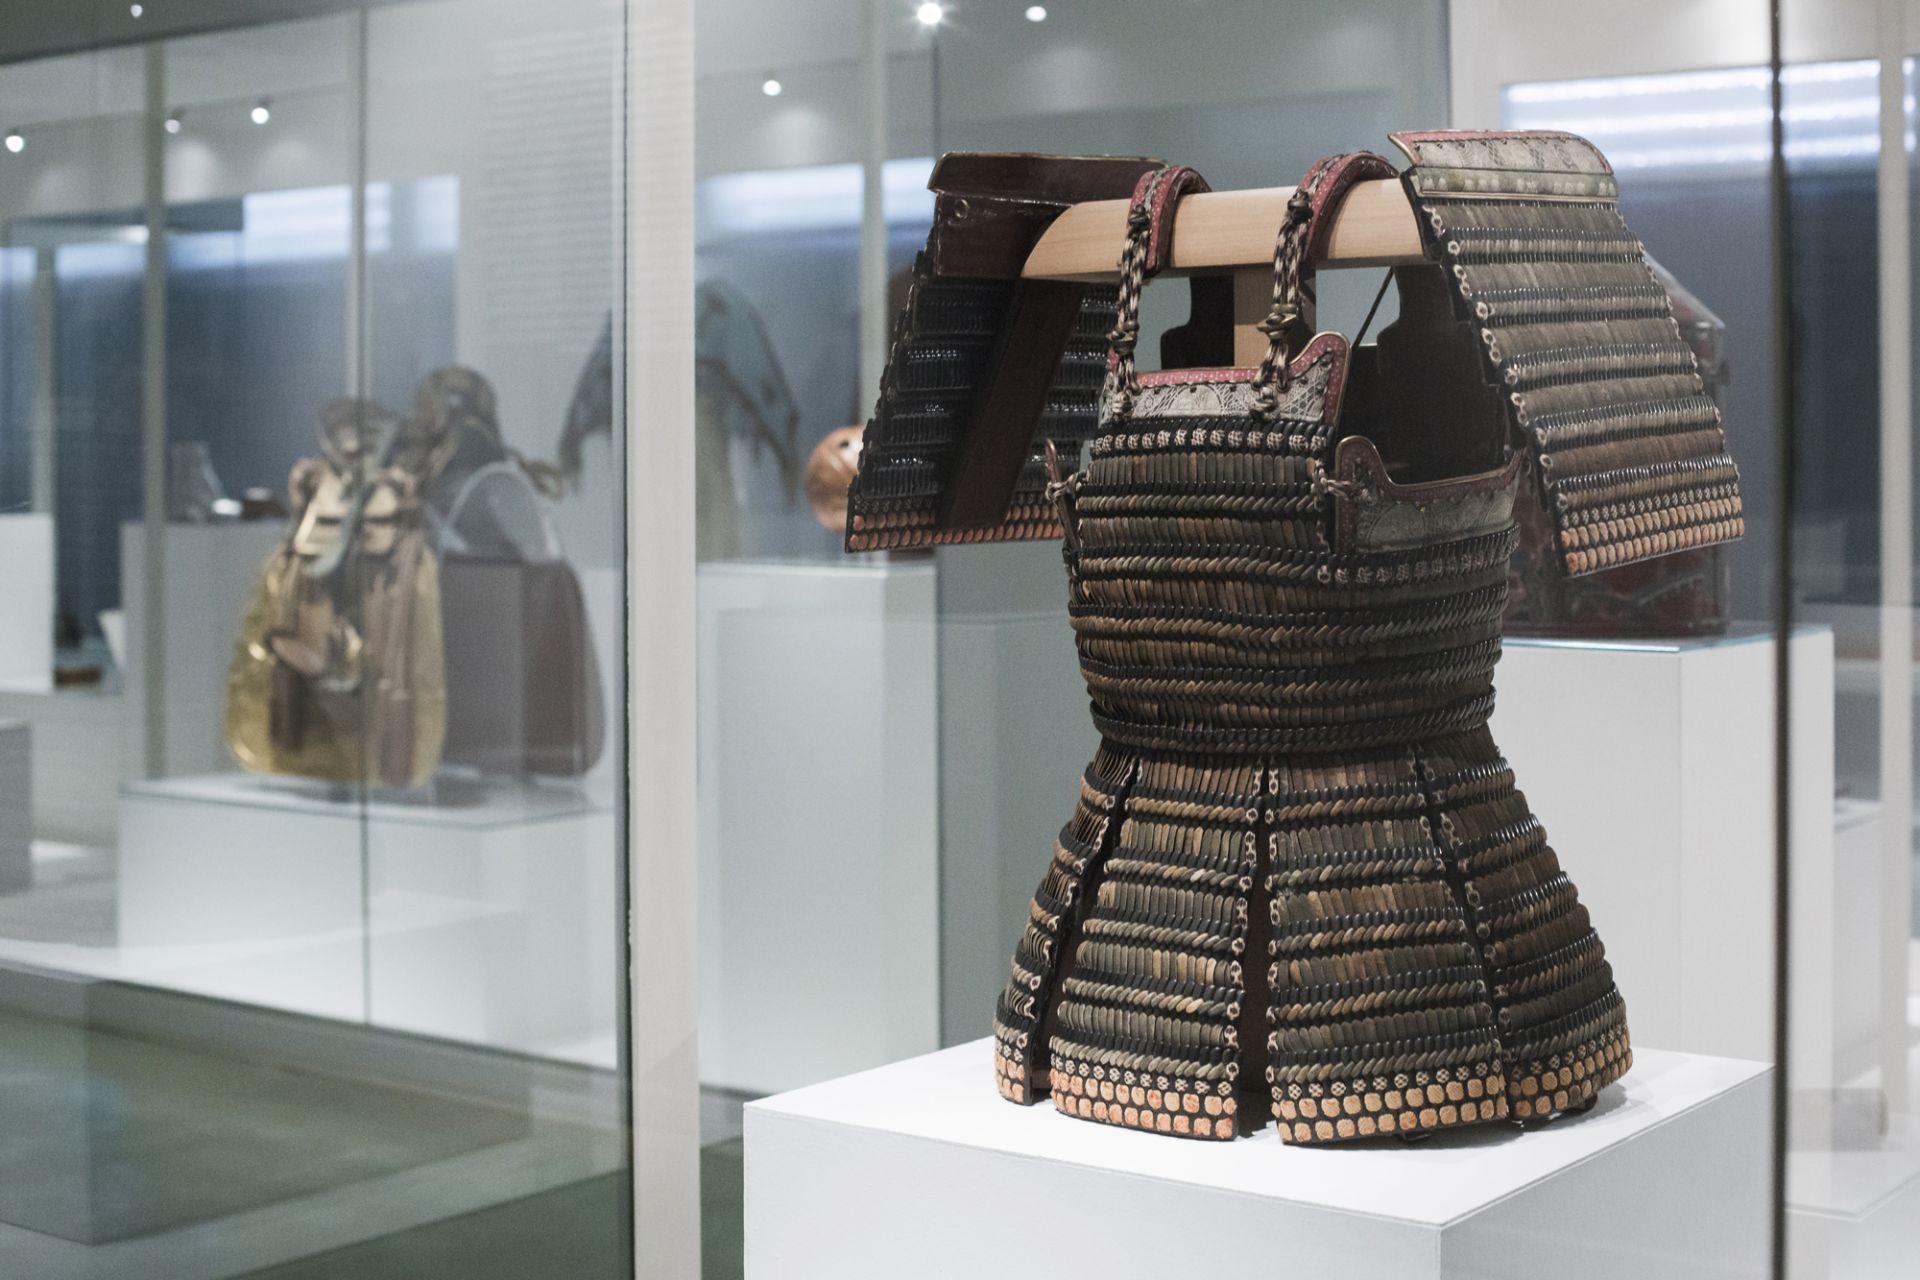 Samurai armor, Japan, undated